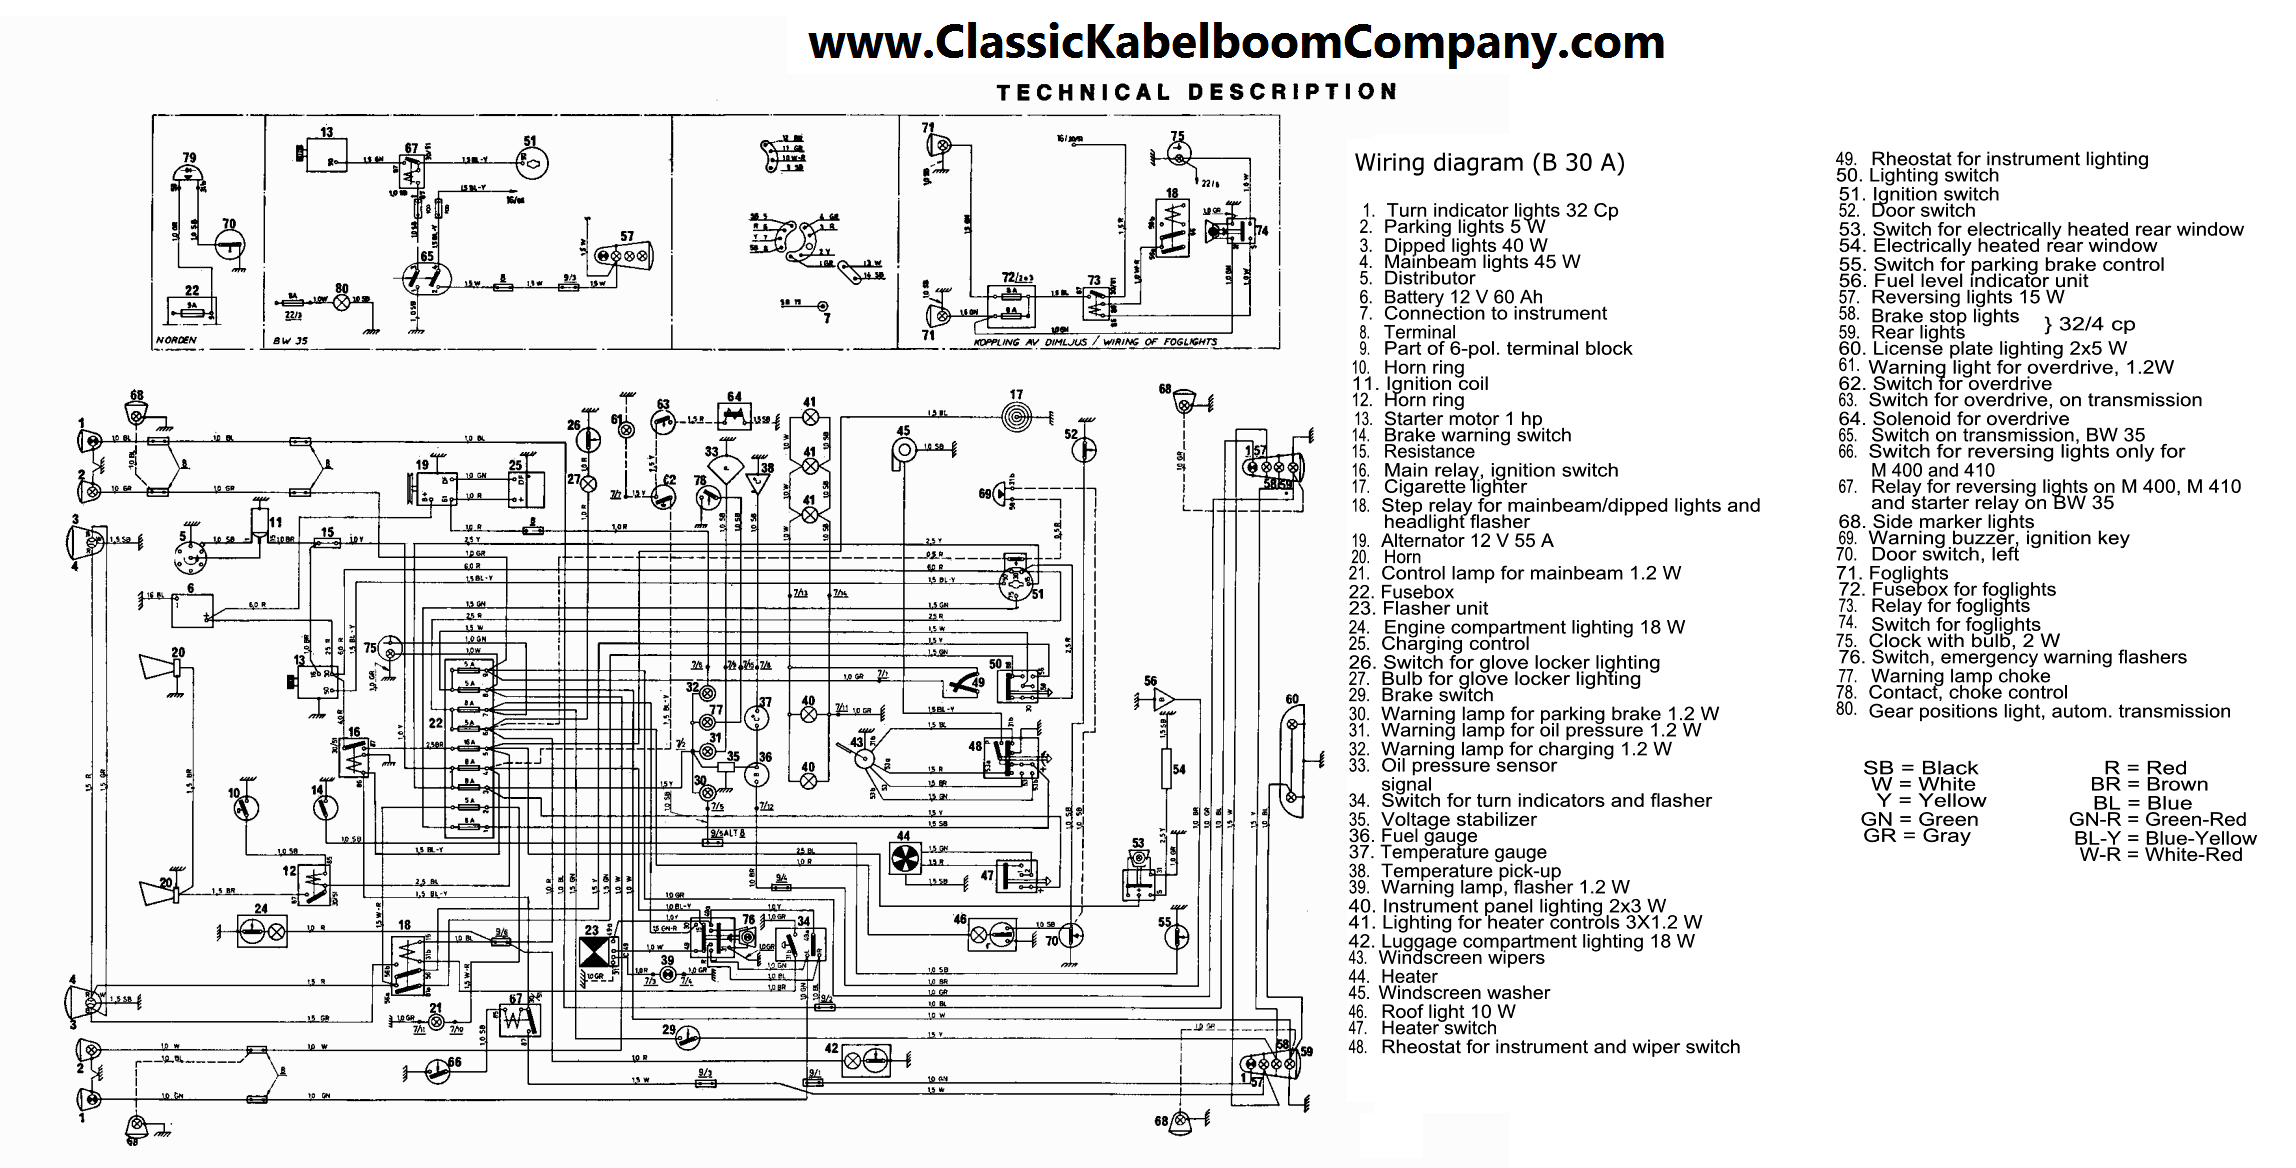 classic kabelboom company elektrisch bedrading schema volvo rh classickabelboomcompany com Audio Wire Diagram 1985 Volvo Volvo XC90 Wiring-Diagram